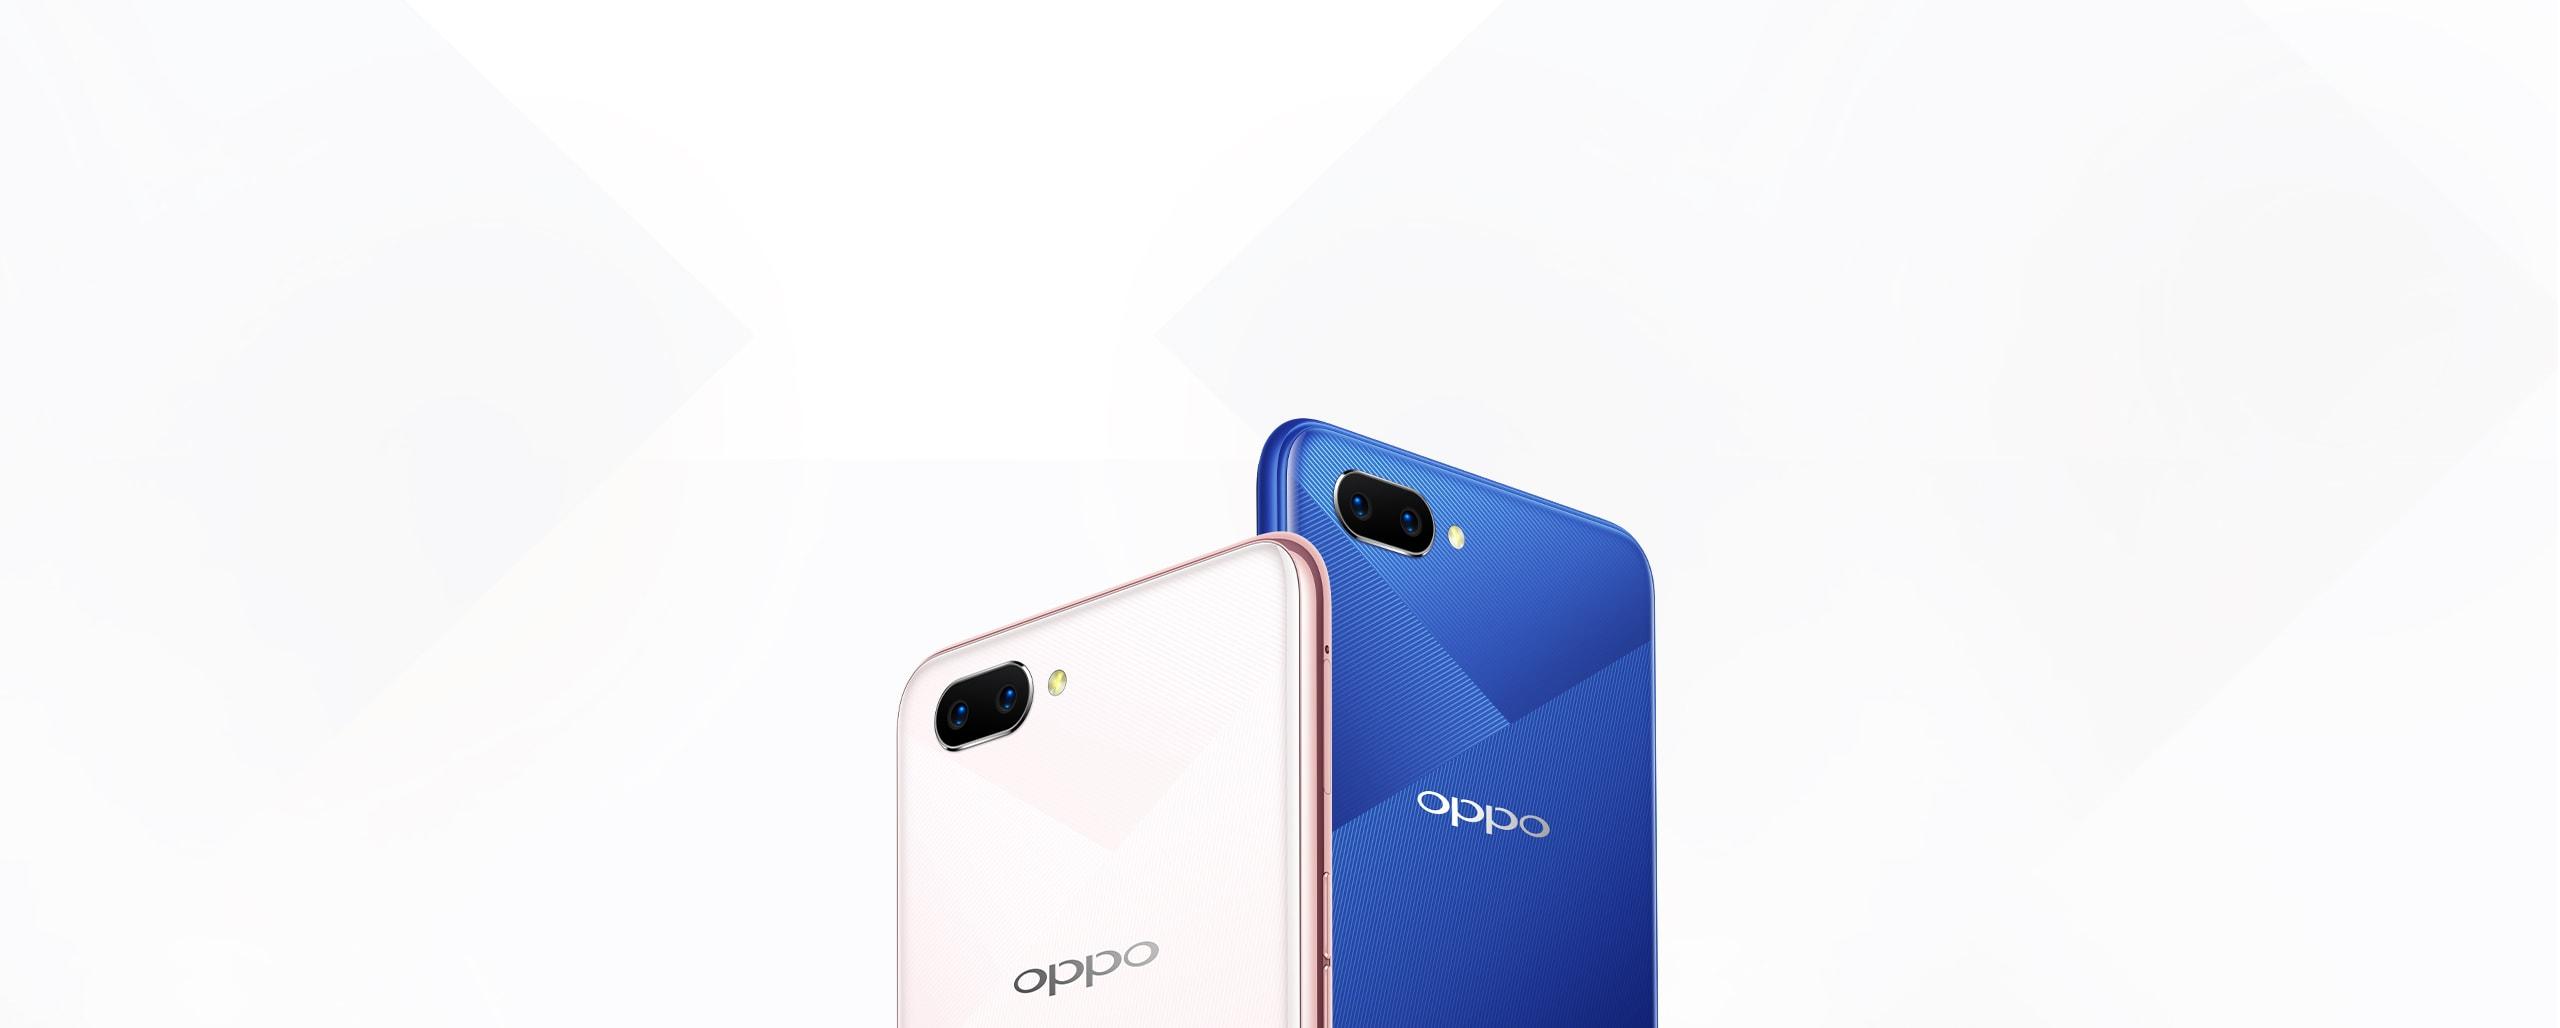 OPPO AX5 - Big Battery, Dual Camera - OPPO New Zealand